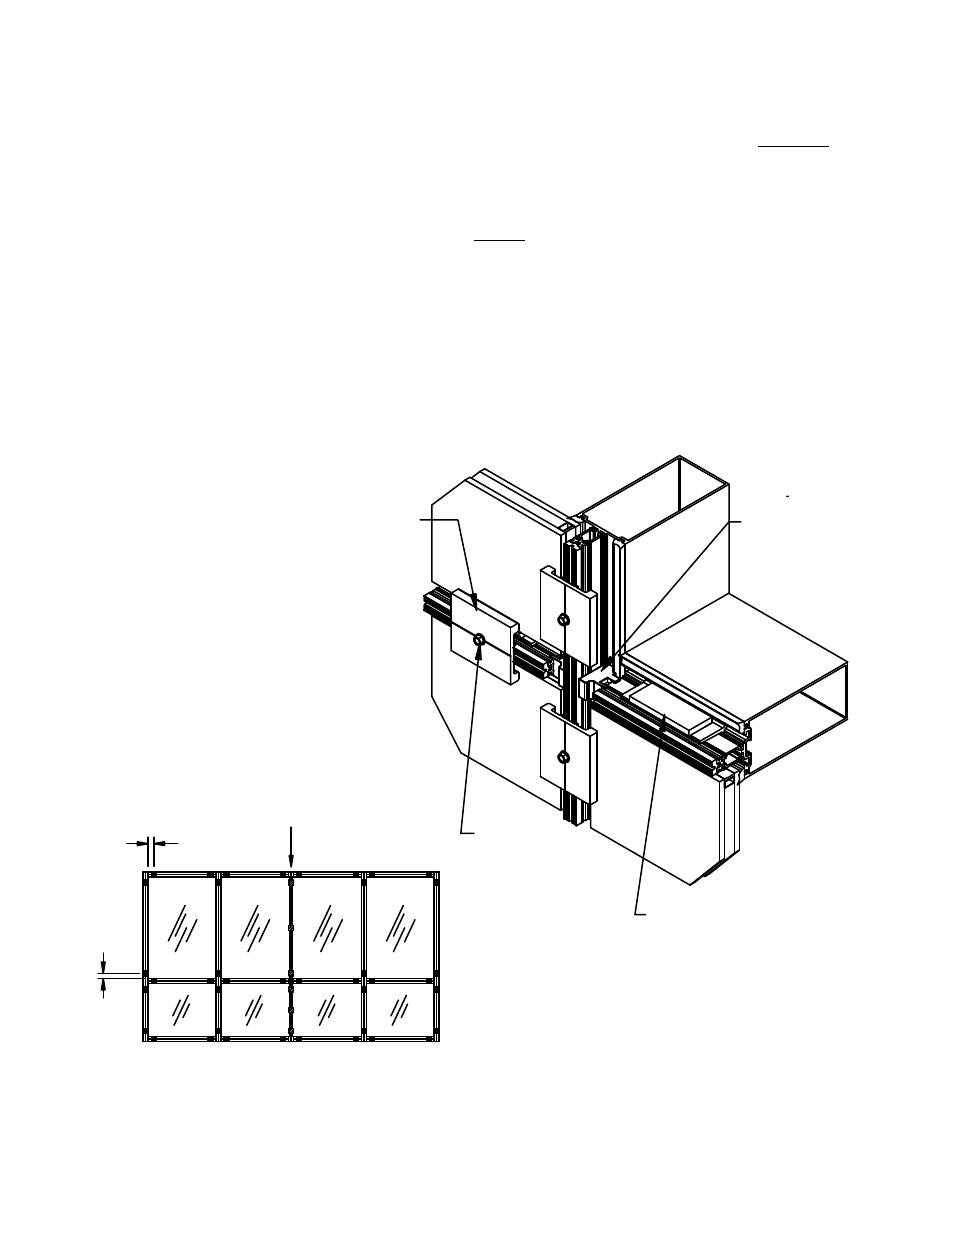 oldcastle buildingenvelope reliance tc